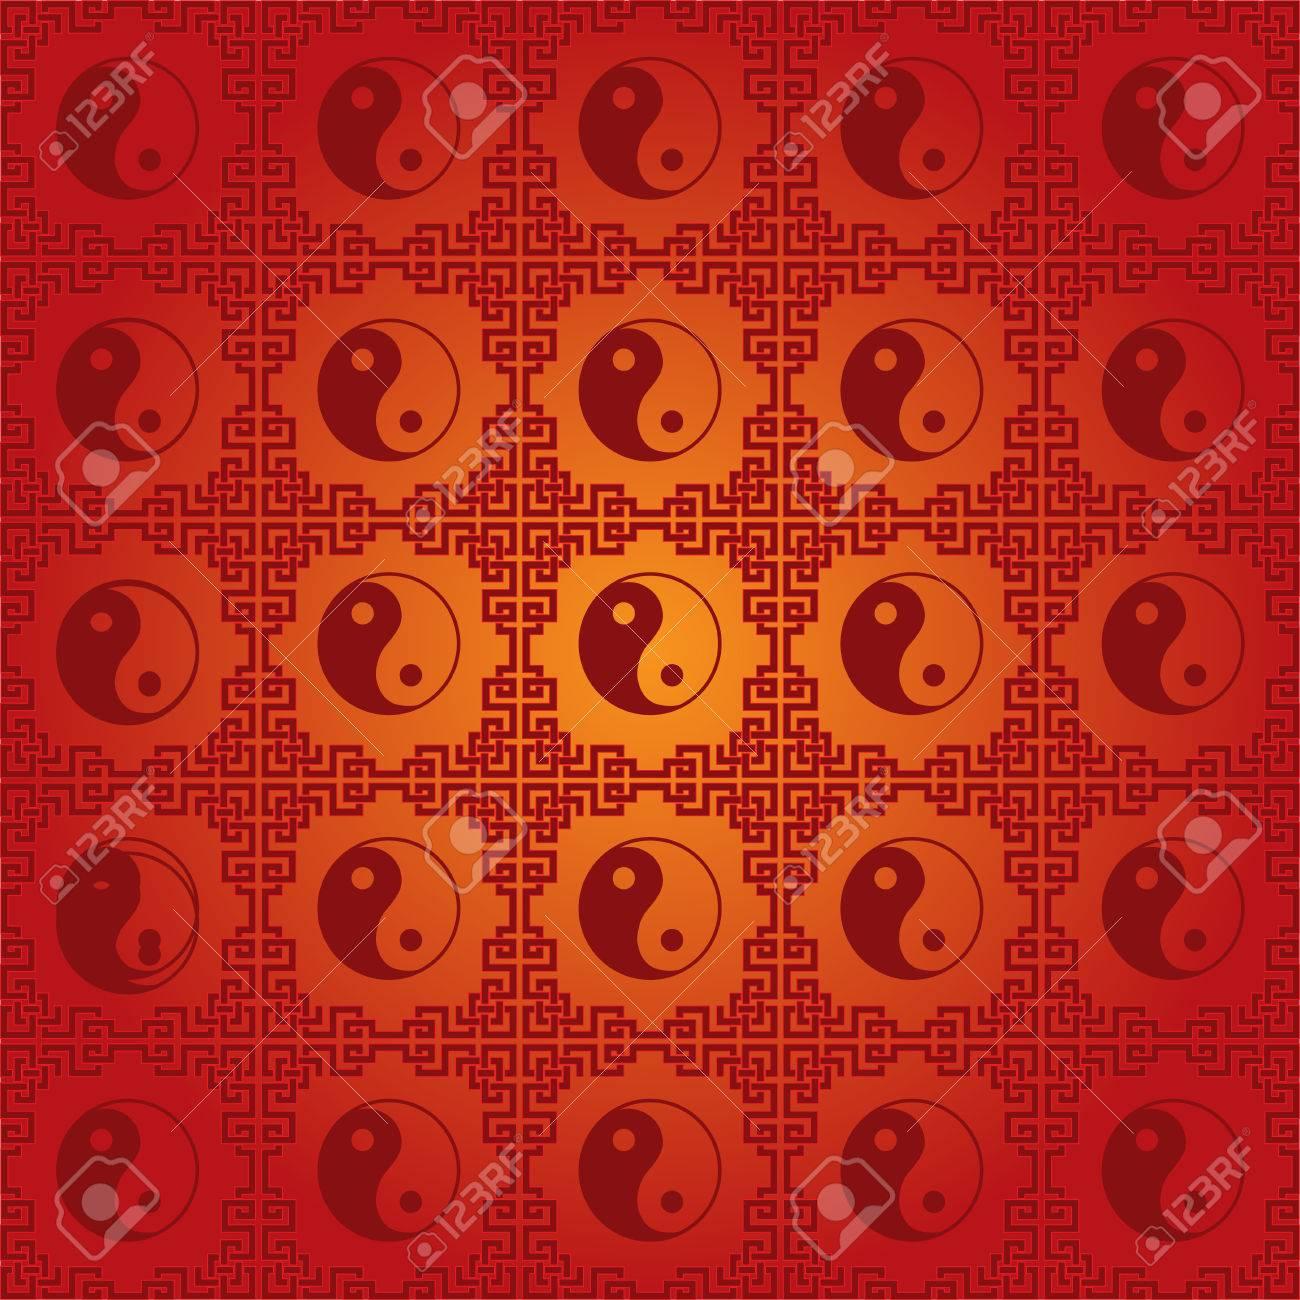 Traditional Chinese Yin Yang Symbol Seamless Wallpaper Stock Vector